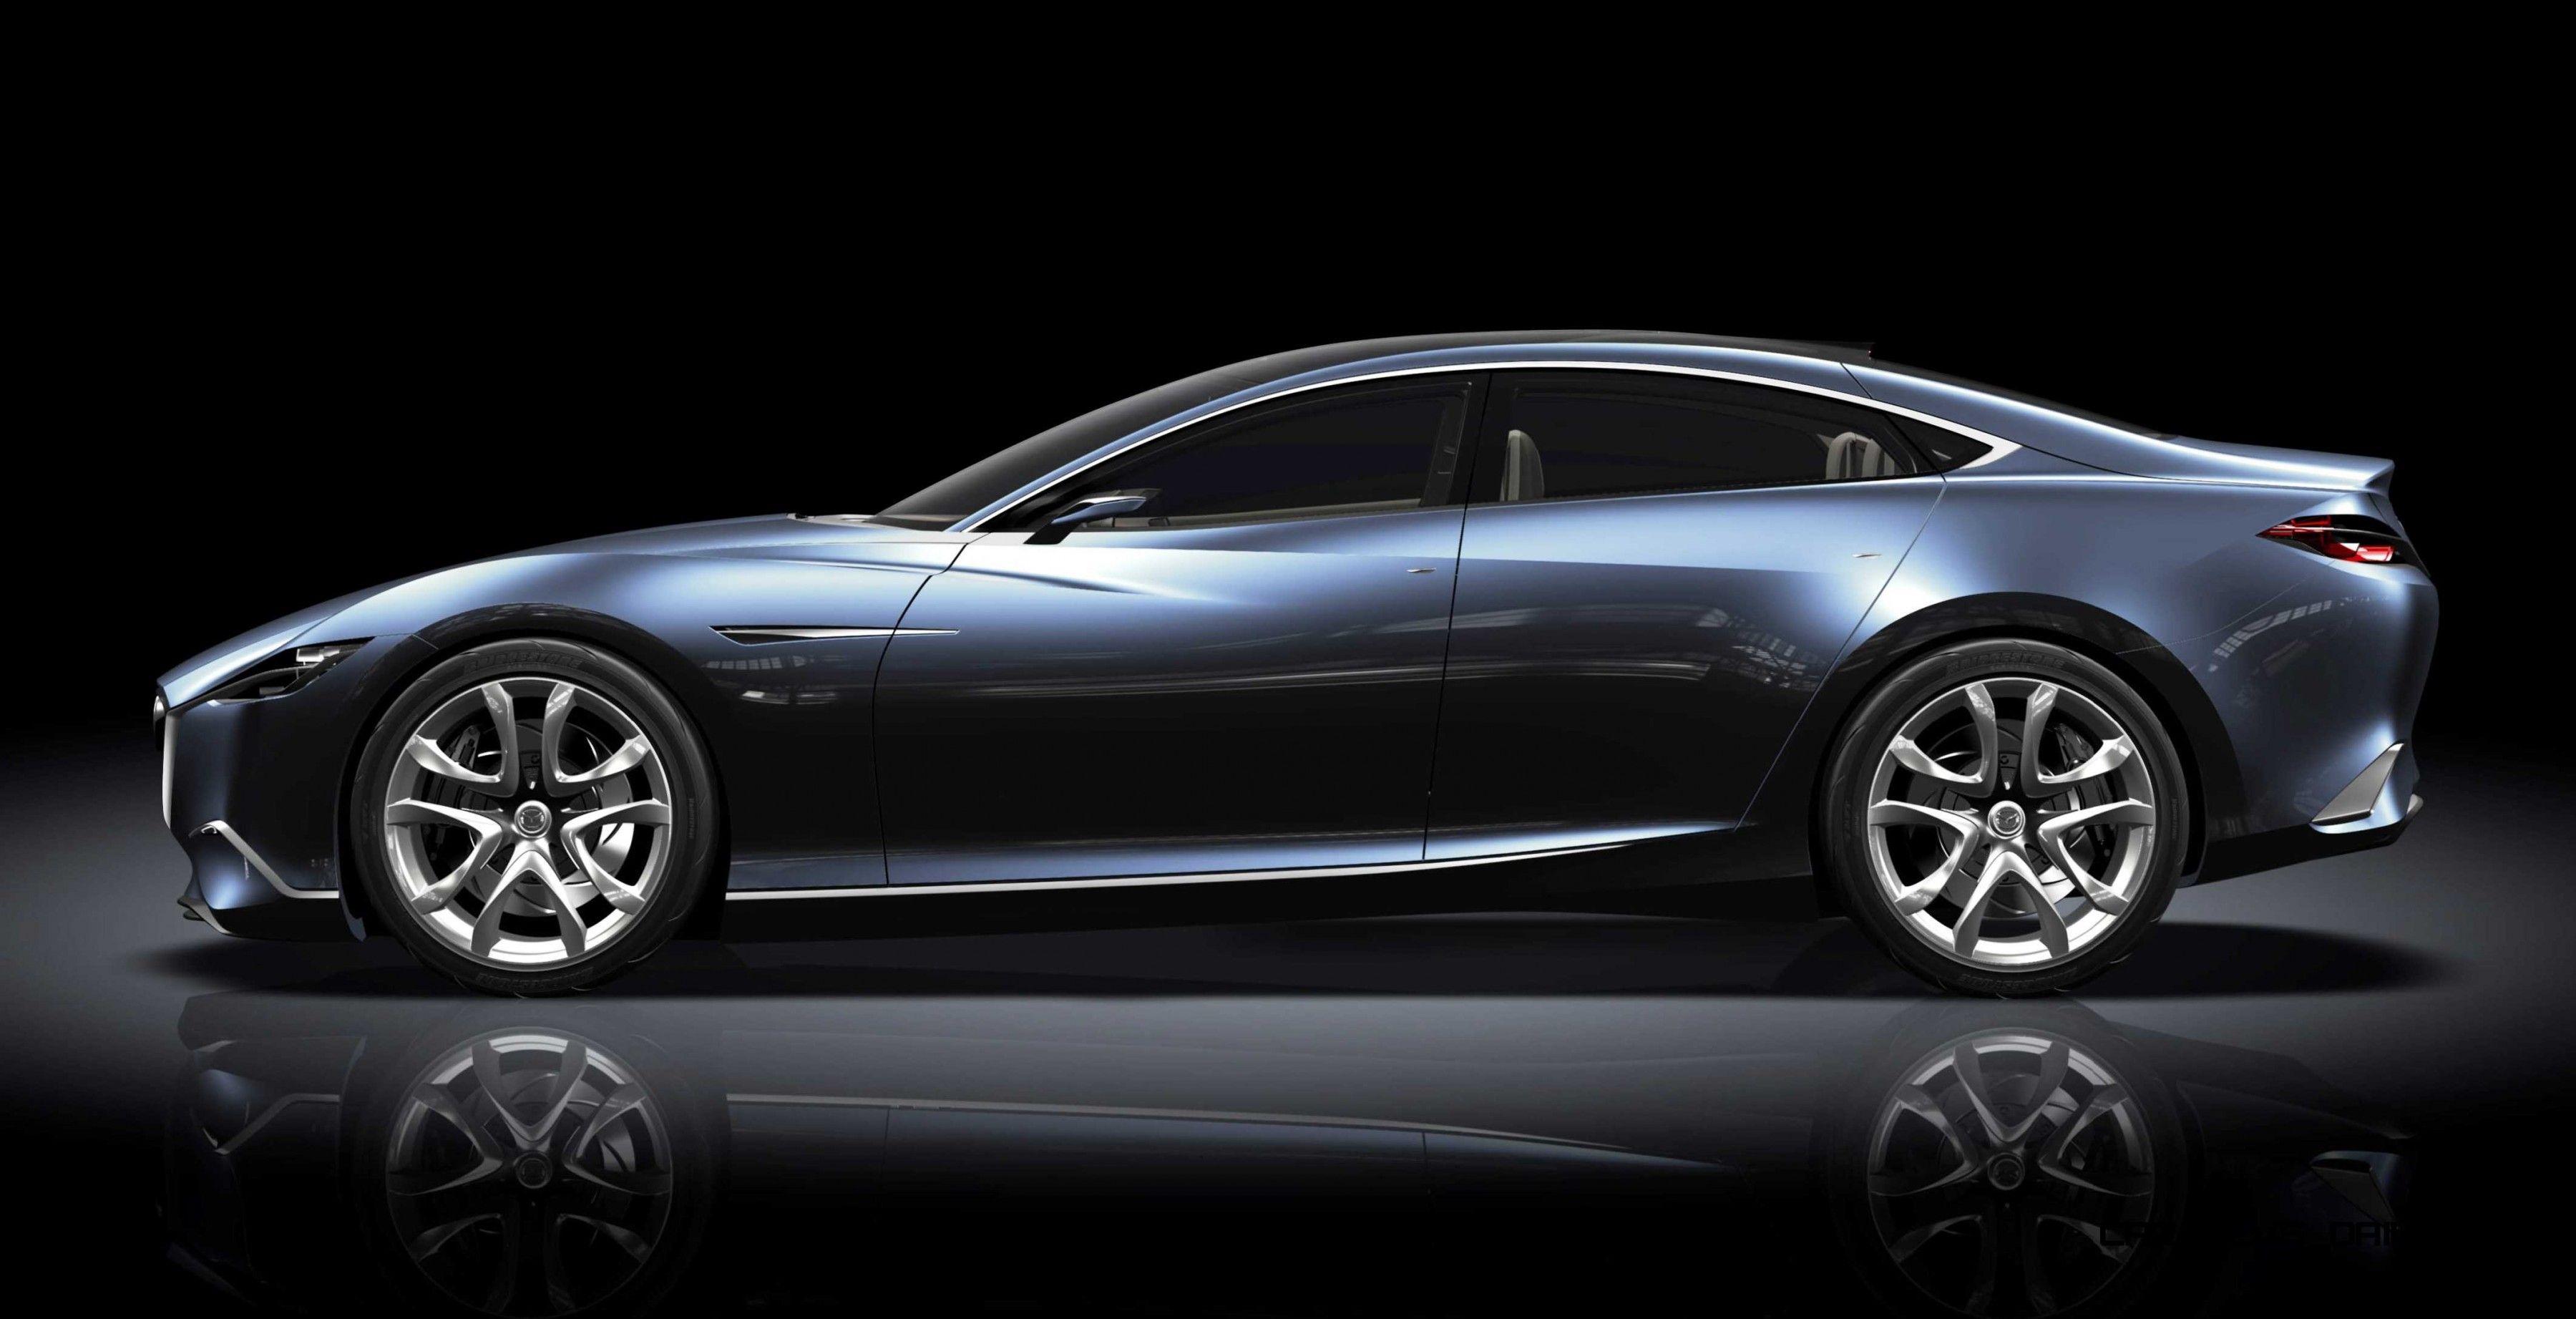 2010 Mazda SHINARI Concept 40   Mazda